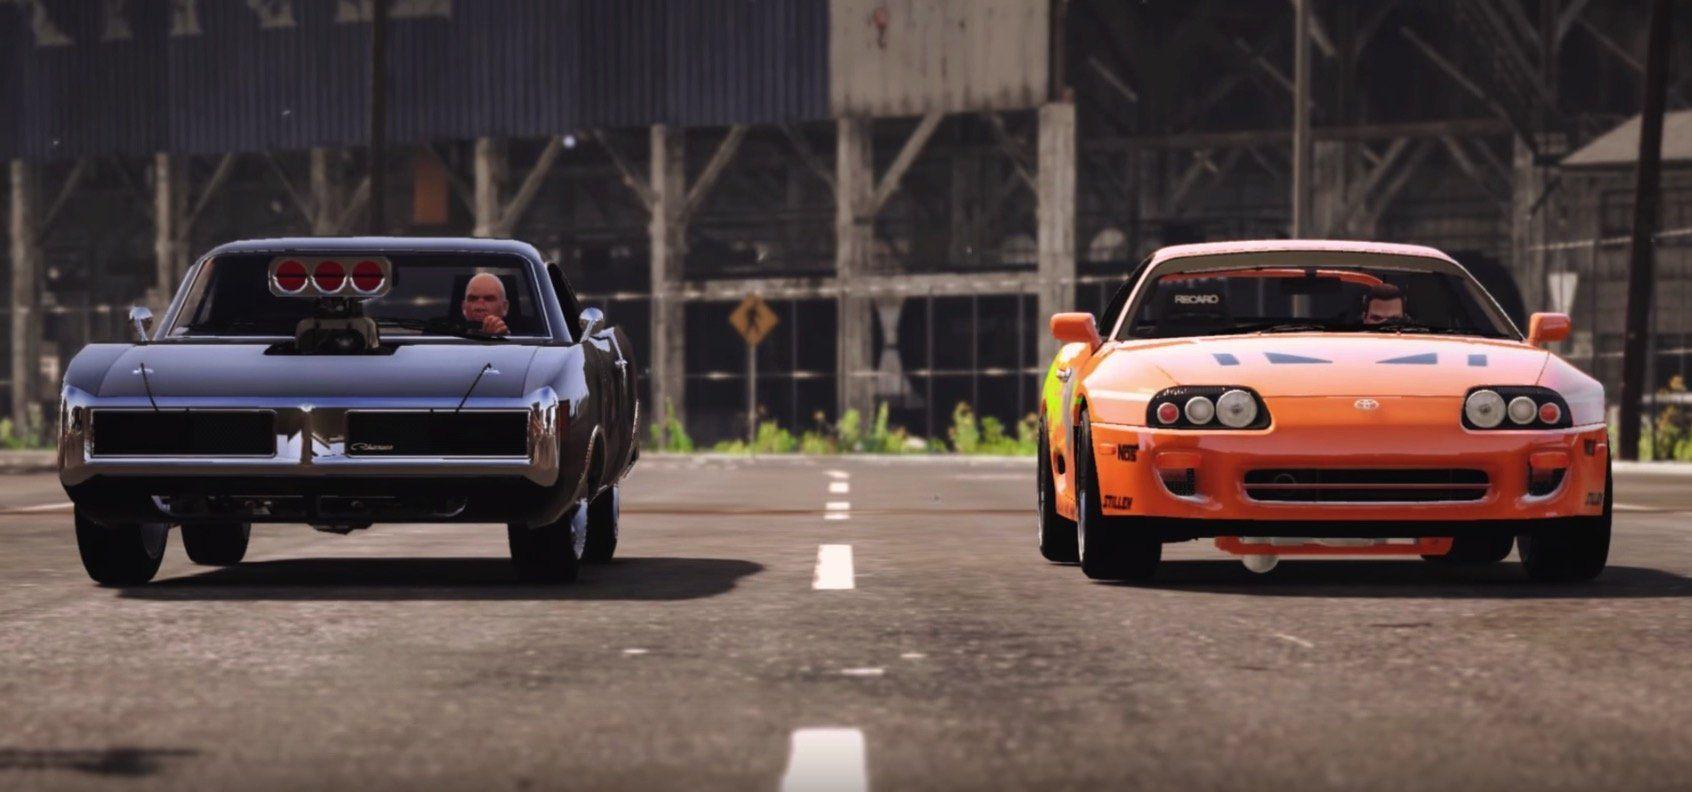 Rockstar Shines The Spotlight On GTA V Fan Videos | Best muscle cars, Gta,  The furious